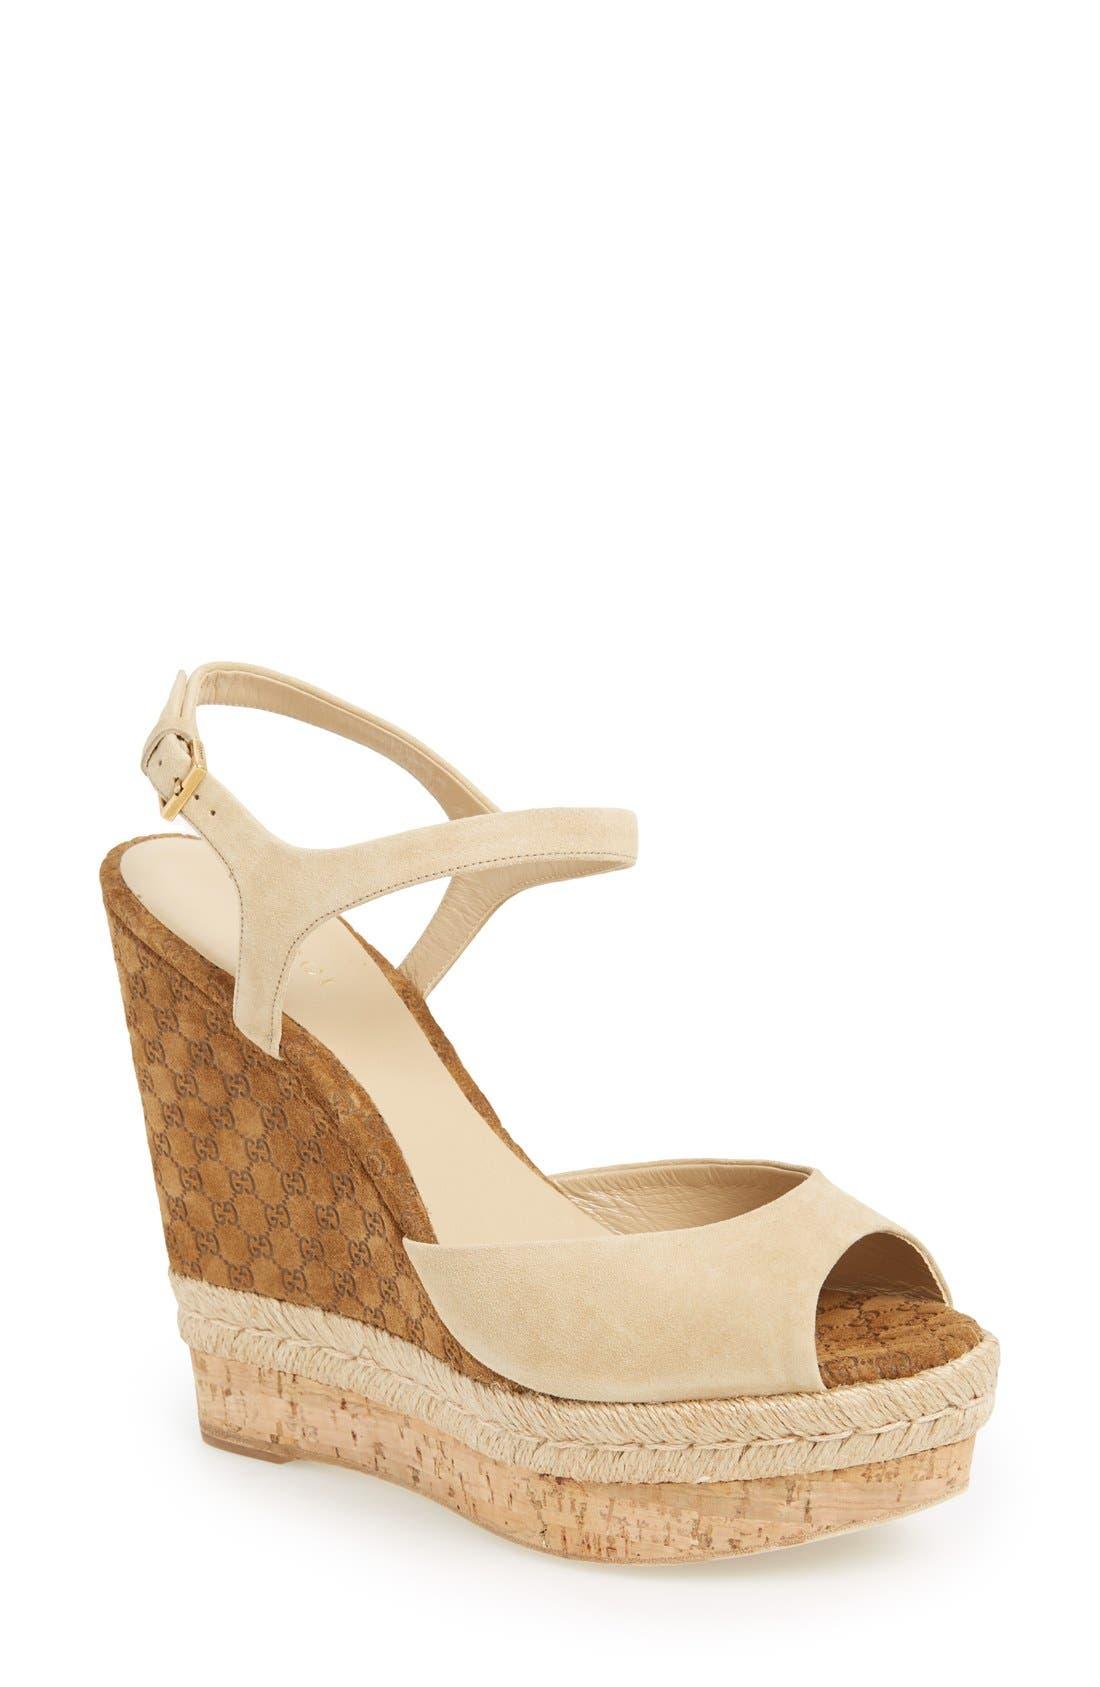 Alternate Image 1 Selected - Gucci 'Hollie' Wedge Sandal (Women)